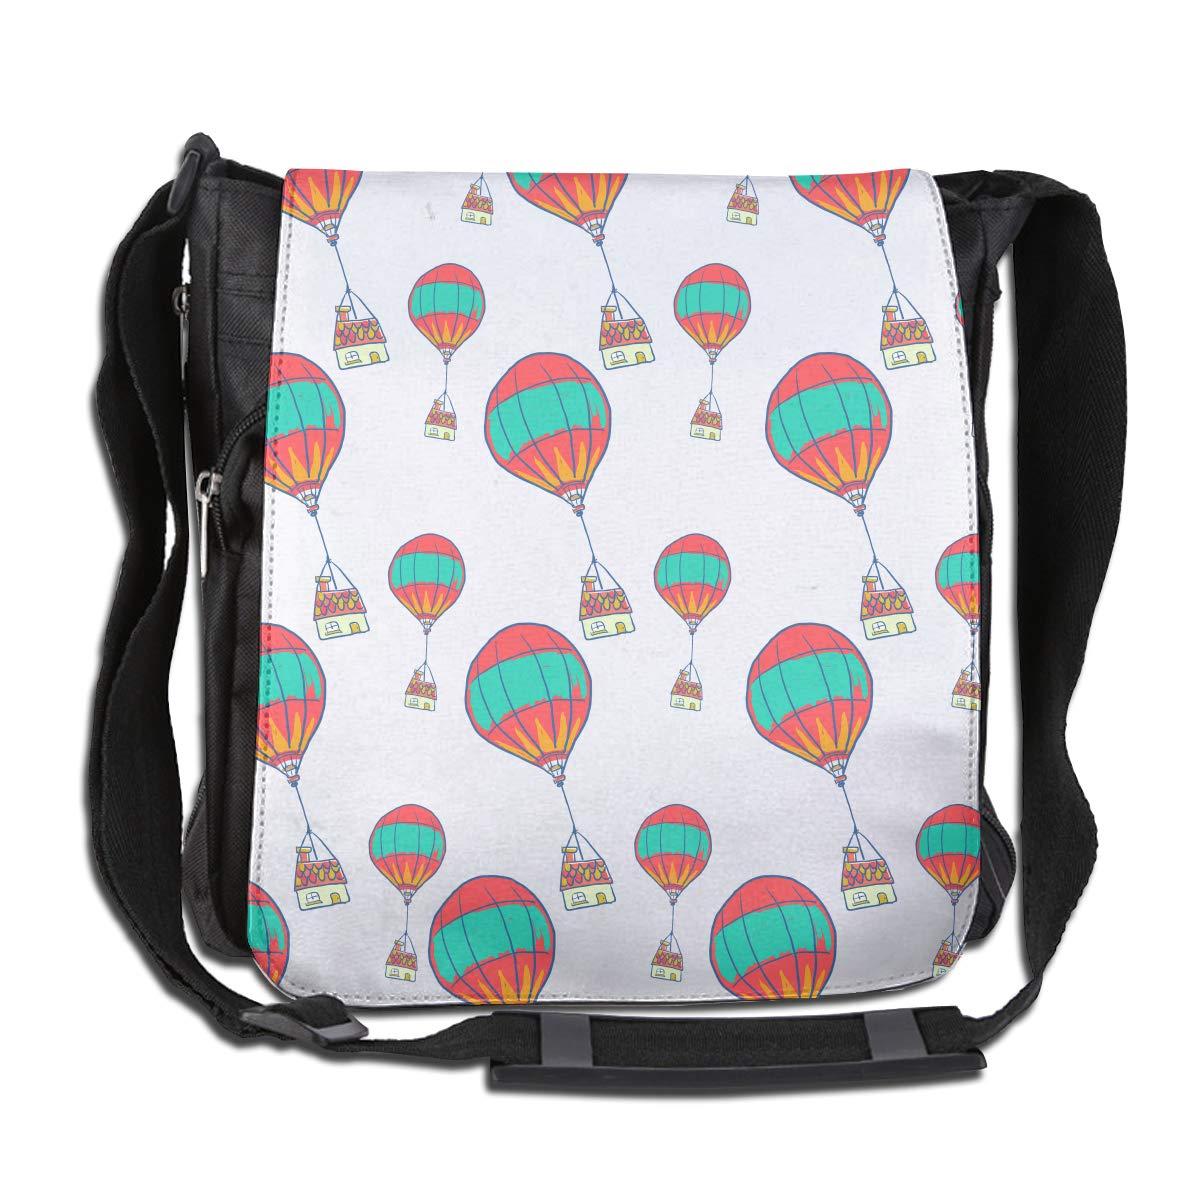 LRHUI Hot Air Balloon Unisex Multifunction Narrow Single Shoulder Bag Diagonal Business Bag